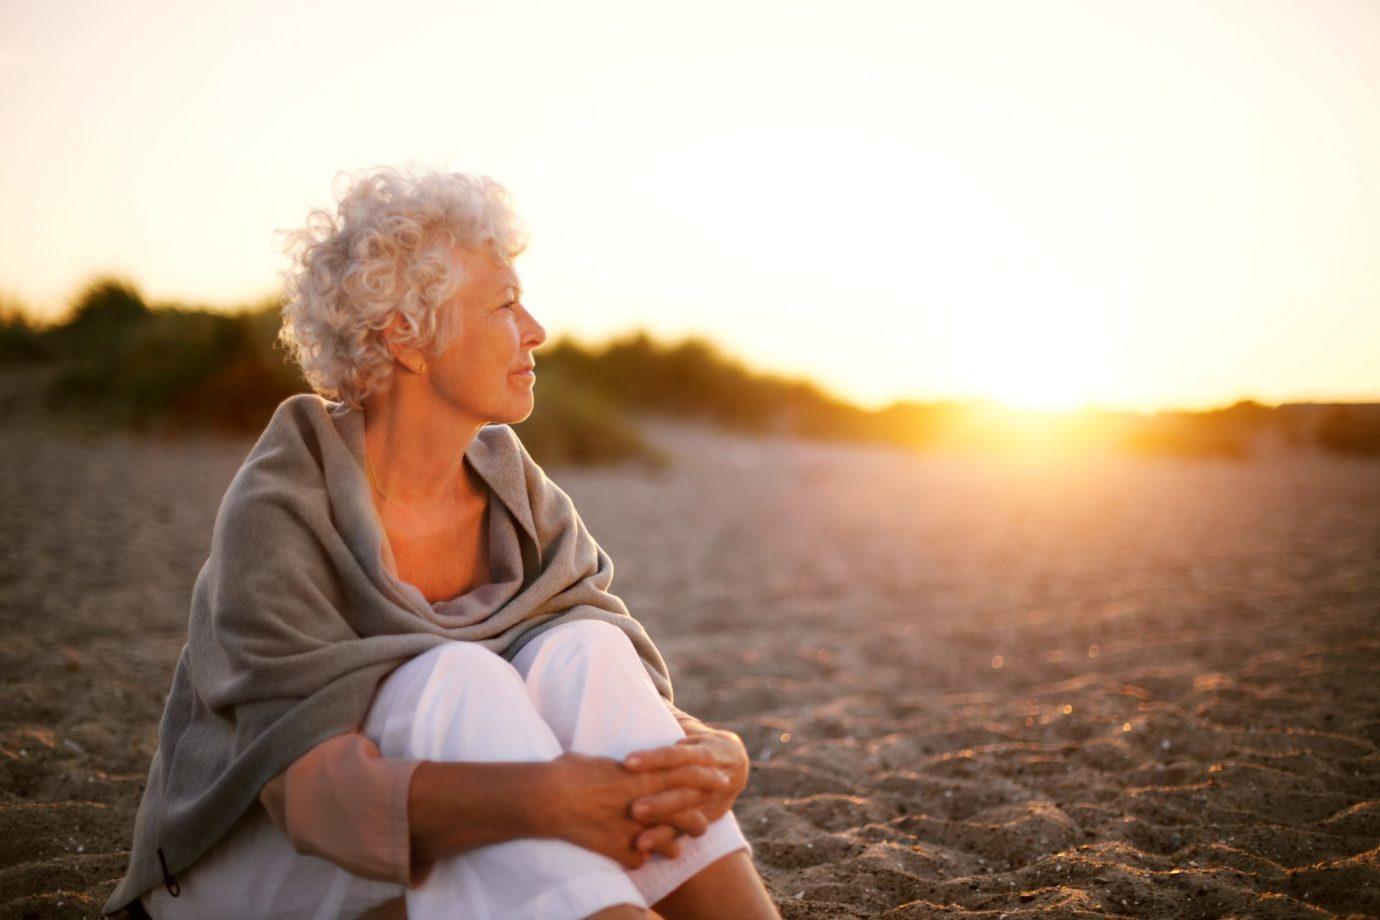 La boca en la menopausia | Parte 1